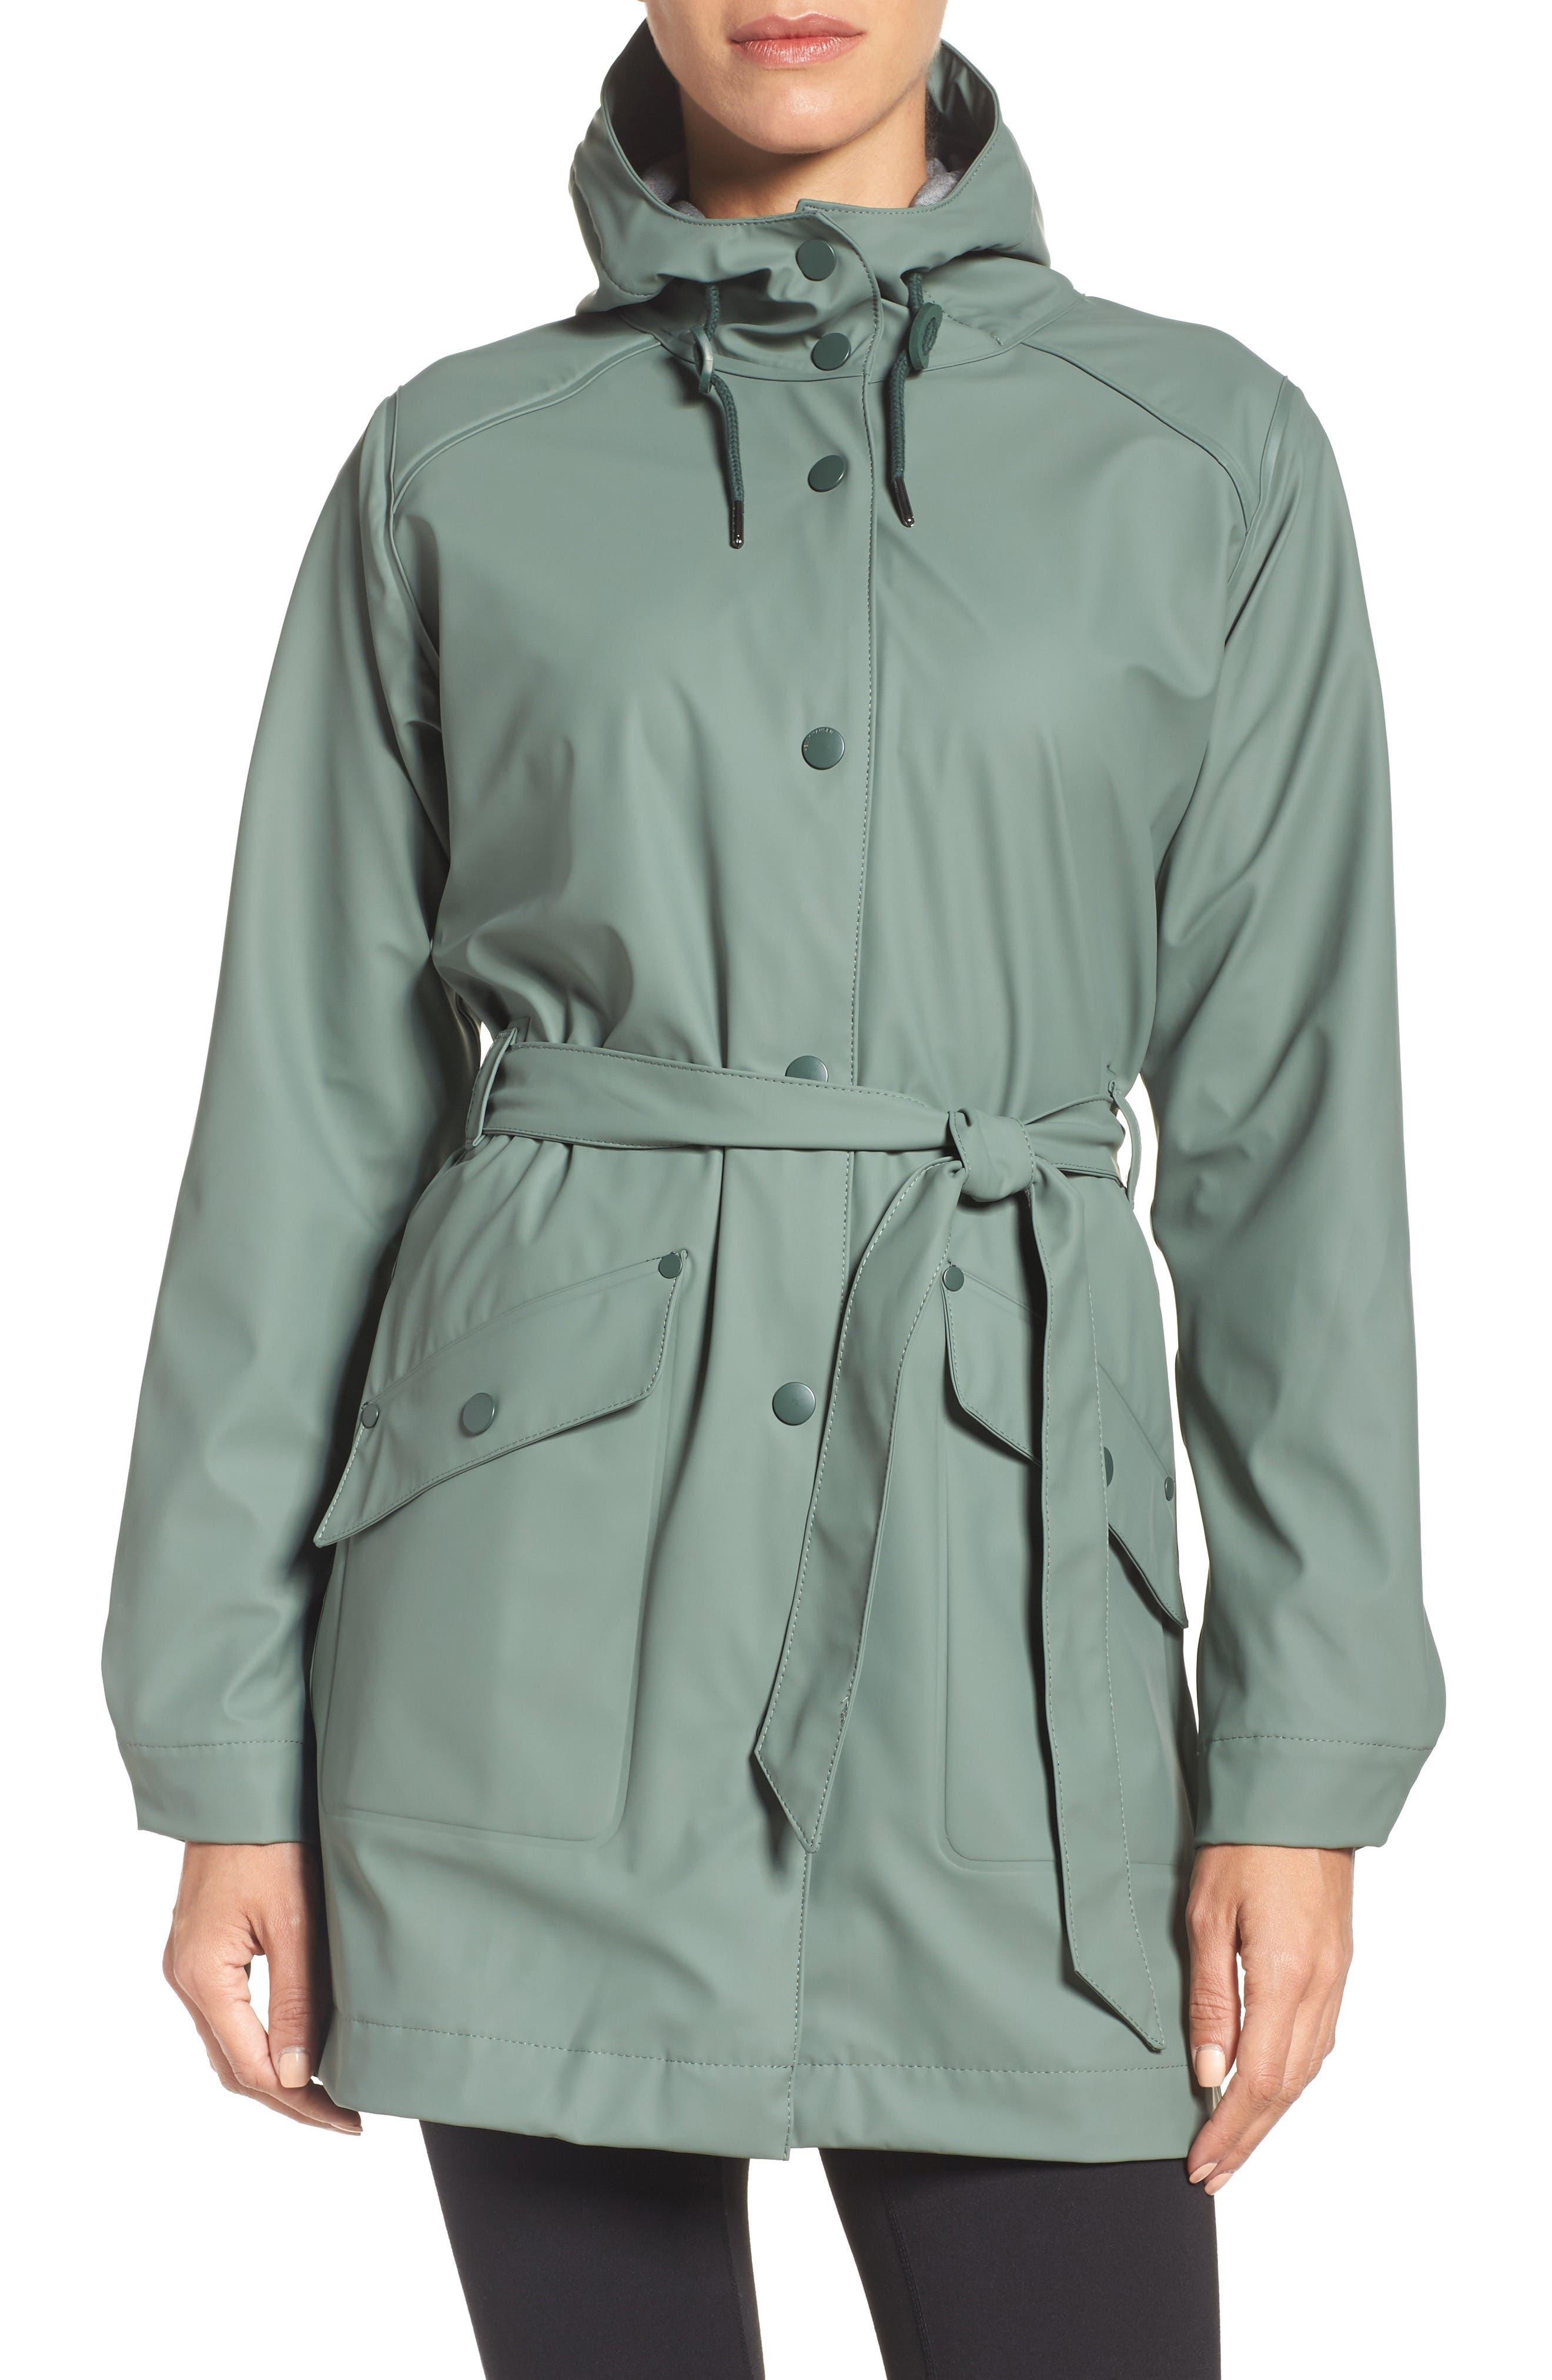 Alternate Image 1 Selected - Helly Hansen Kirkwall Raincoat